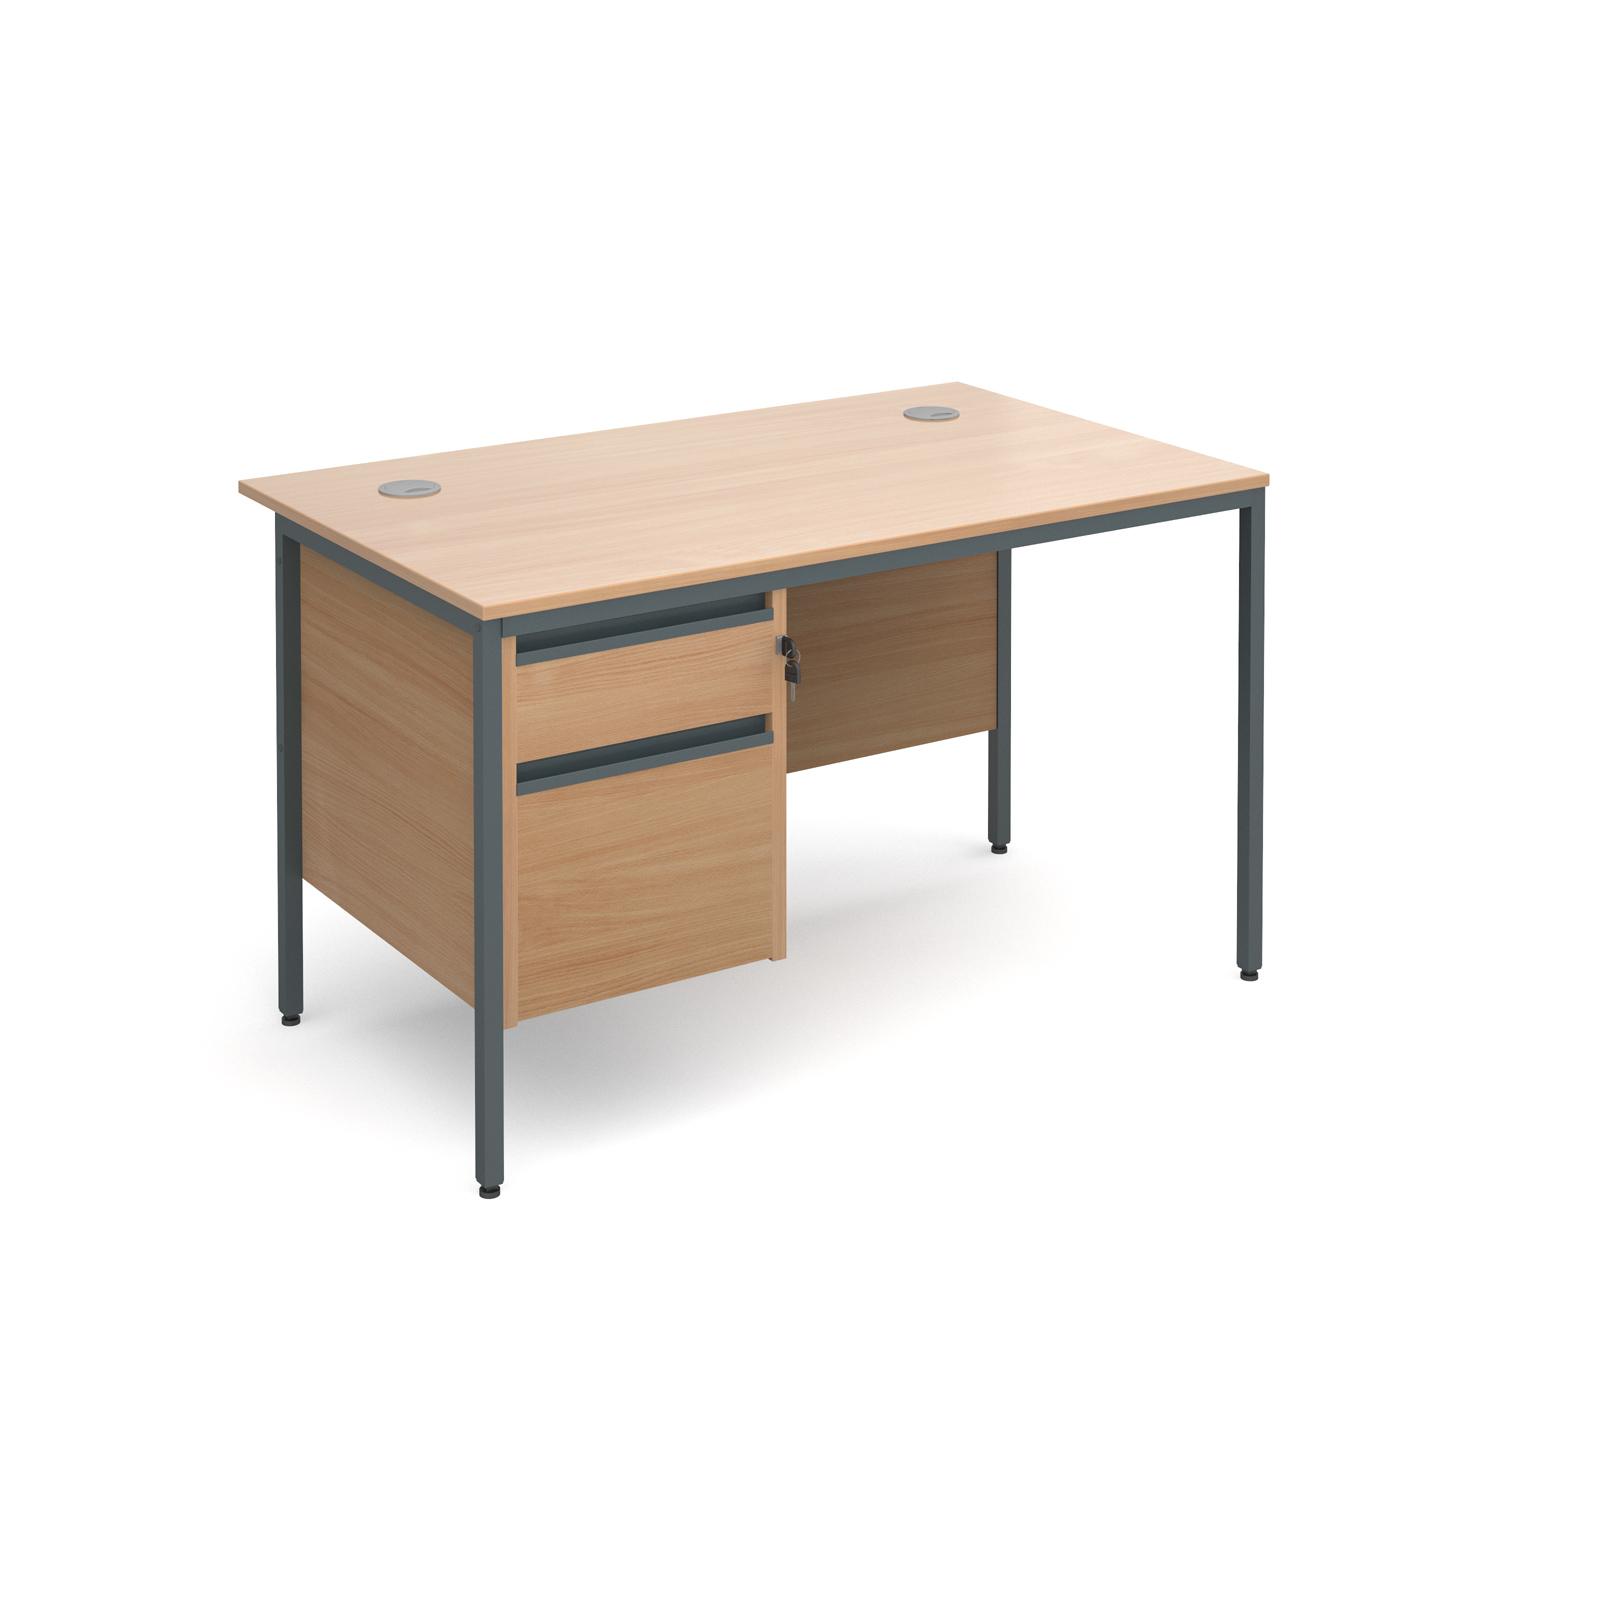 Maestro H frame straight desk with 2 drawer pedestal 1228mm - beech